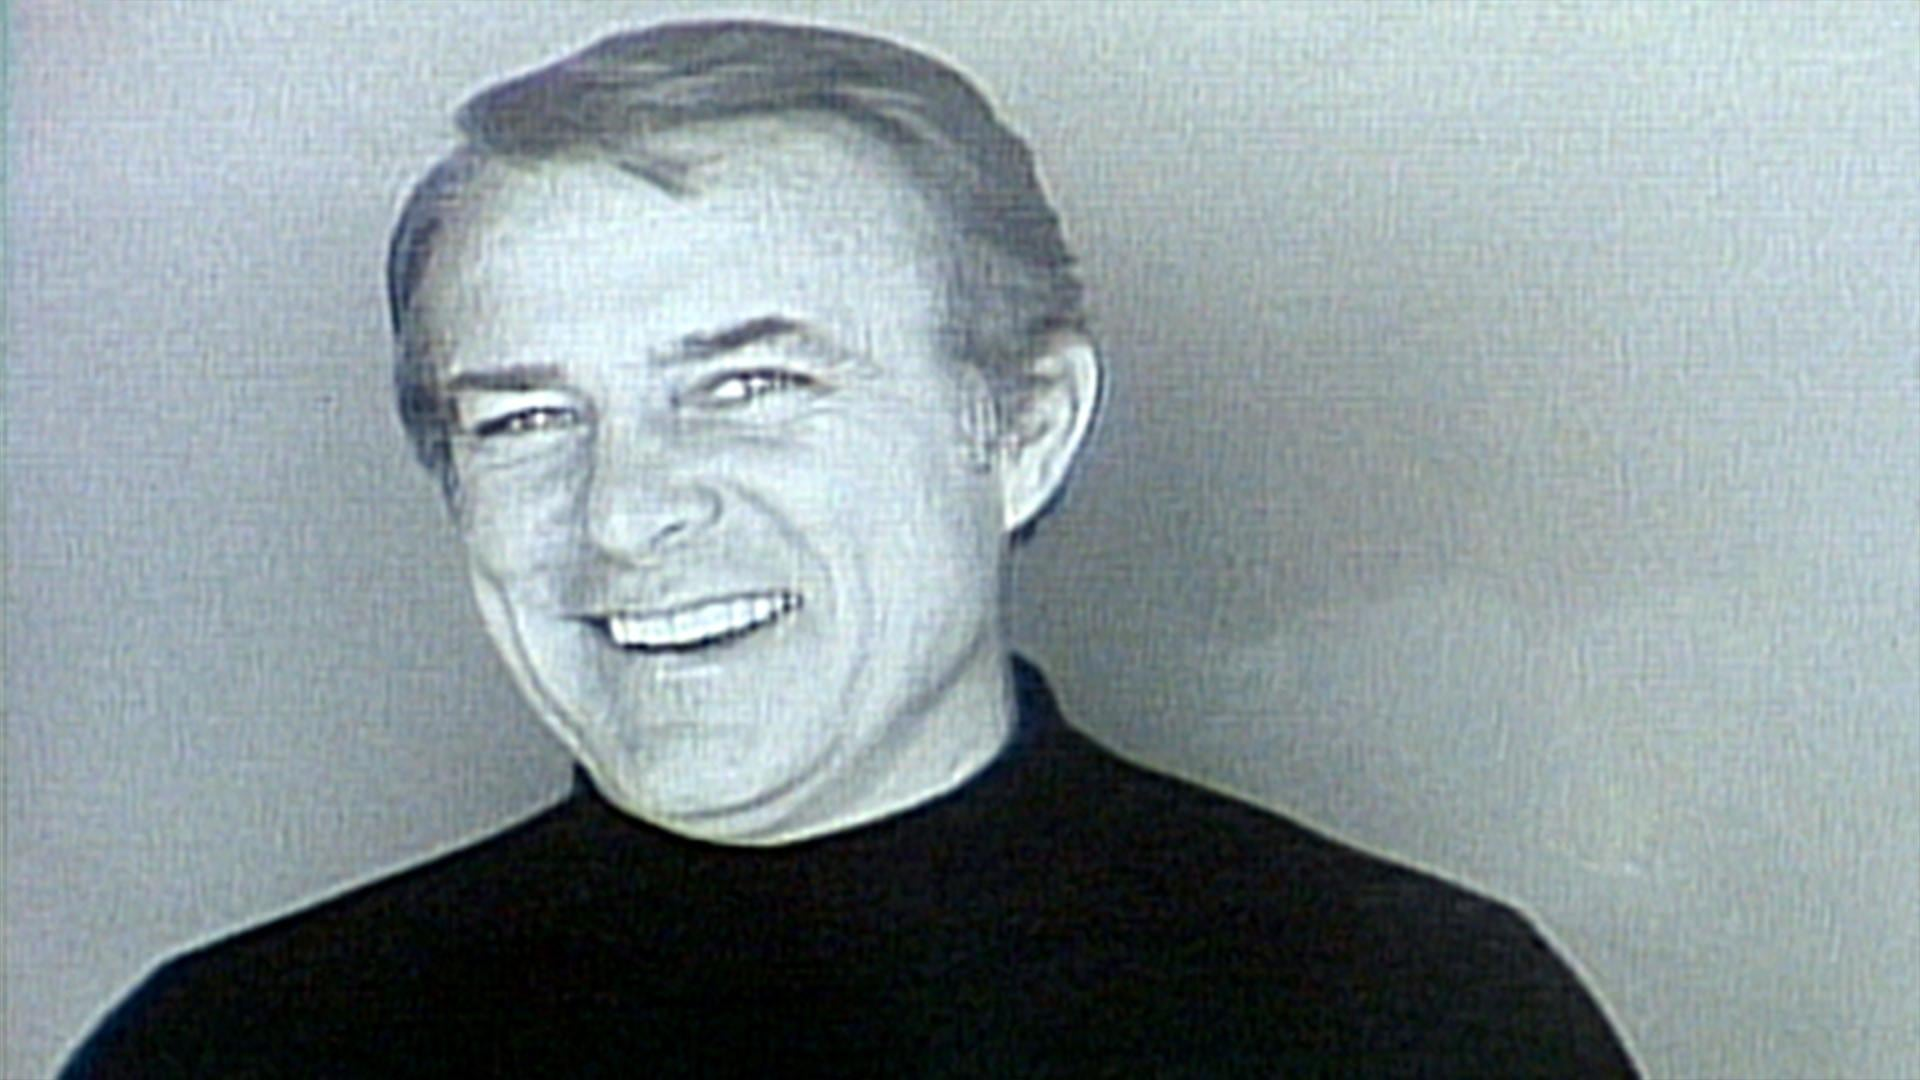 Robert Conrad: January 23, 1982